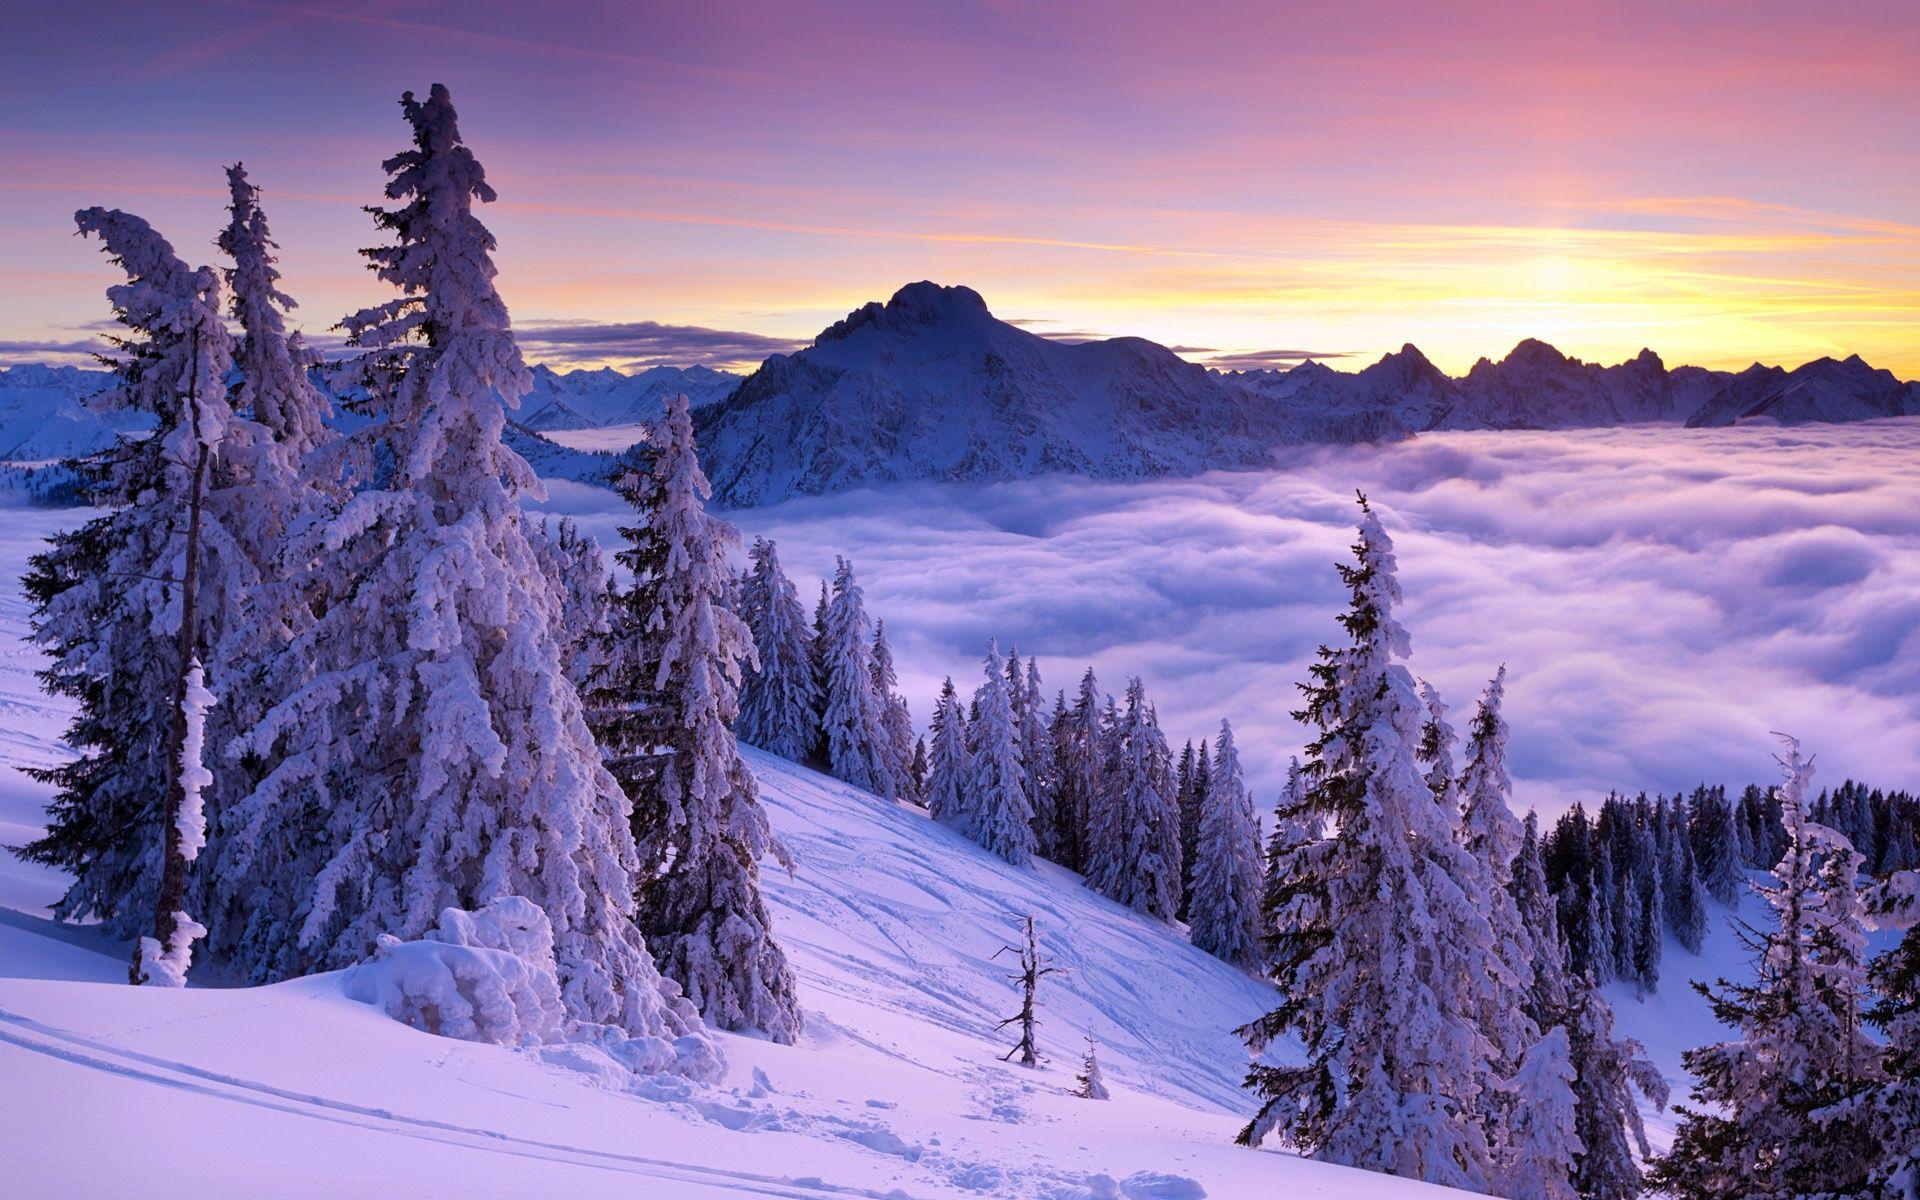 Desktophdwallpaper Org Winter Landscape Winter Screensavers Winter Wallpaper